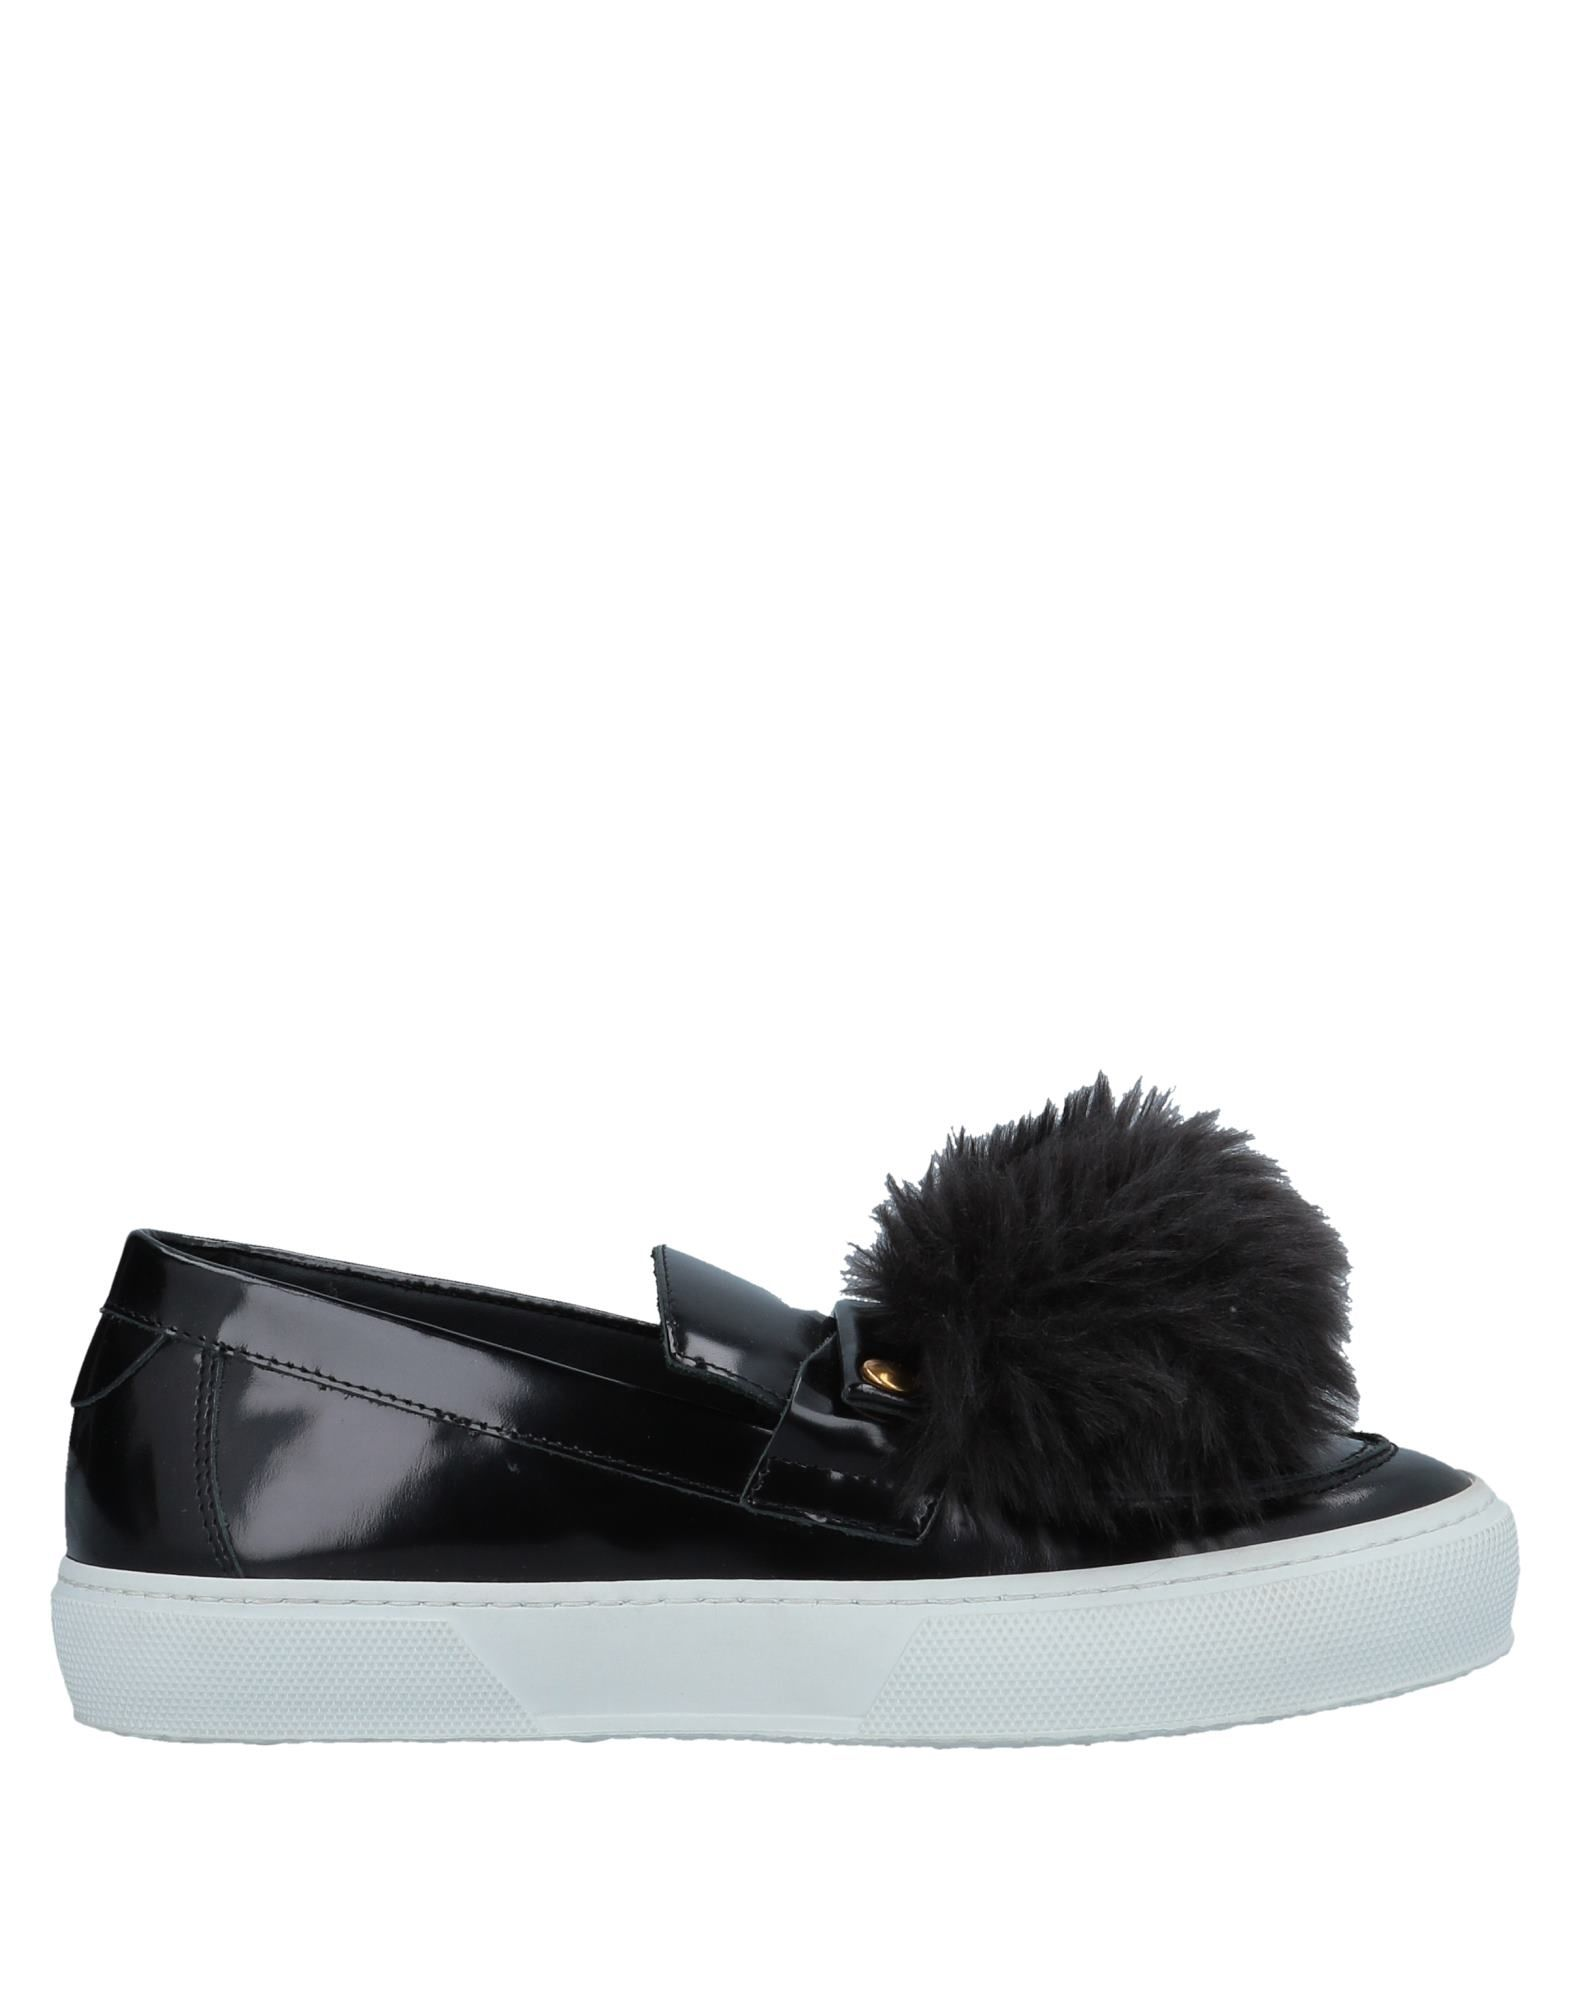 L'f 11549929EGGut Shoes Mokassins Damen  11549929EGGut L'f aussehende strapazierfähige Schuhe 2cd127